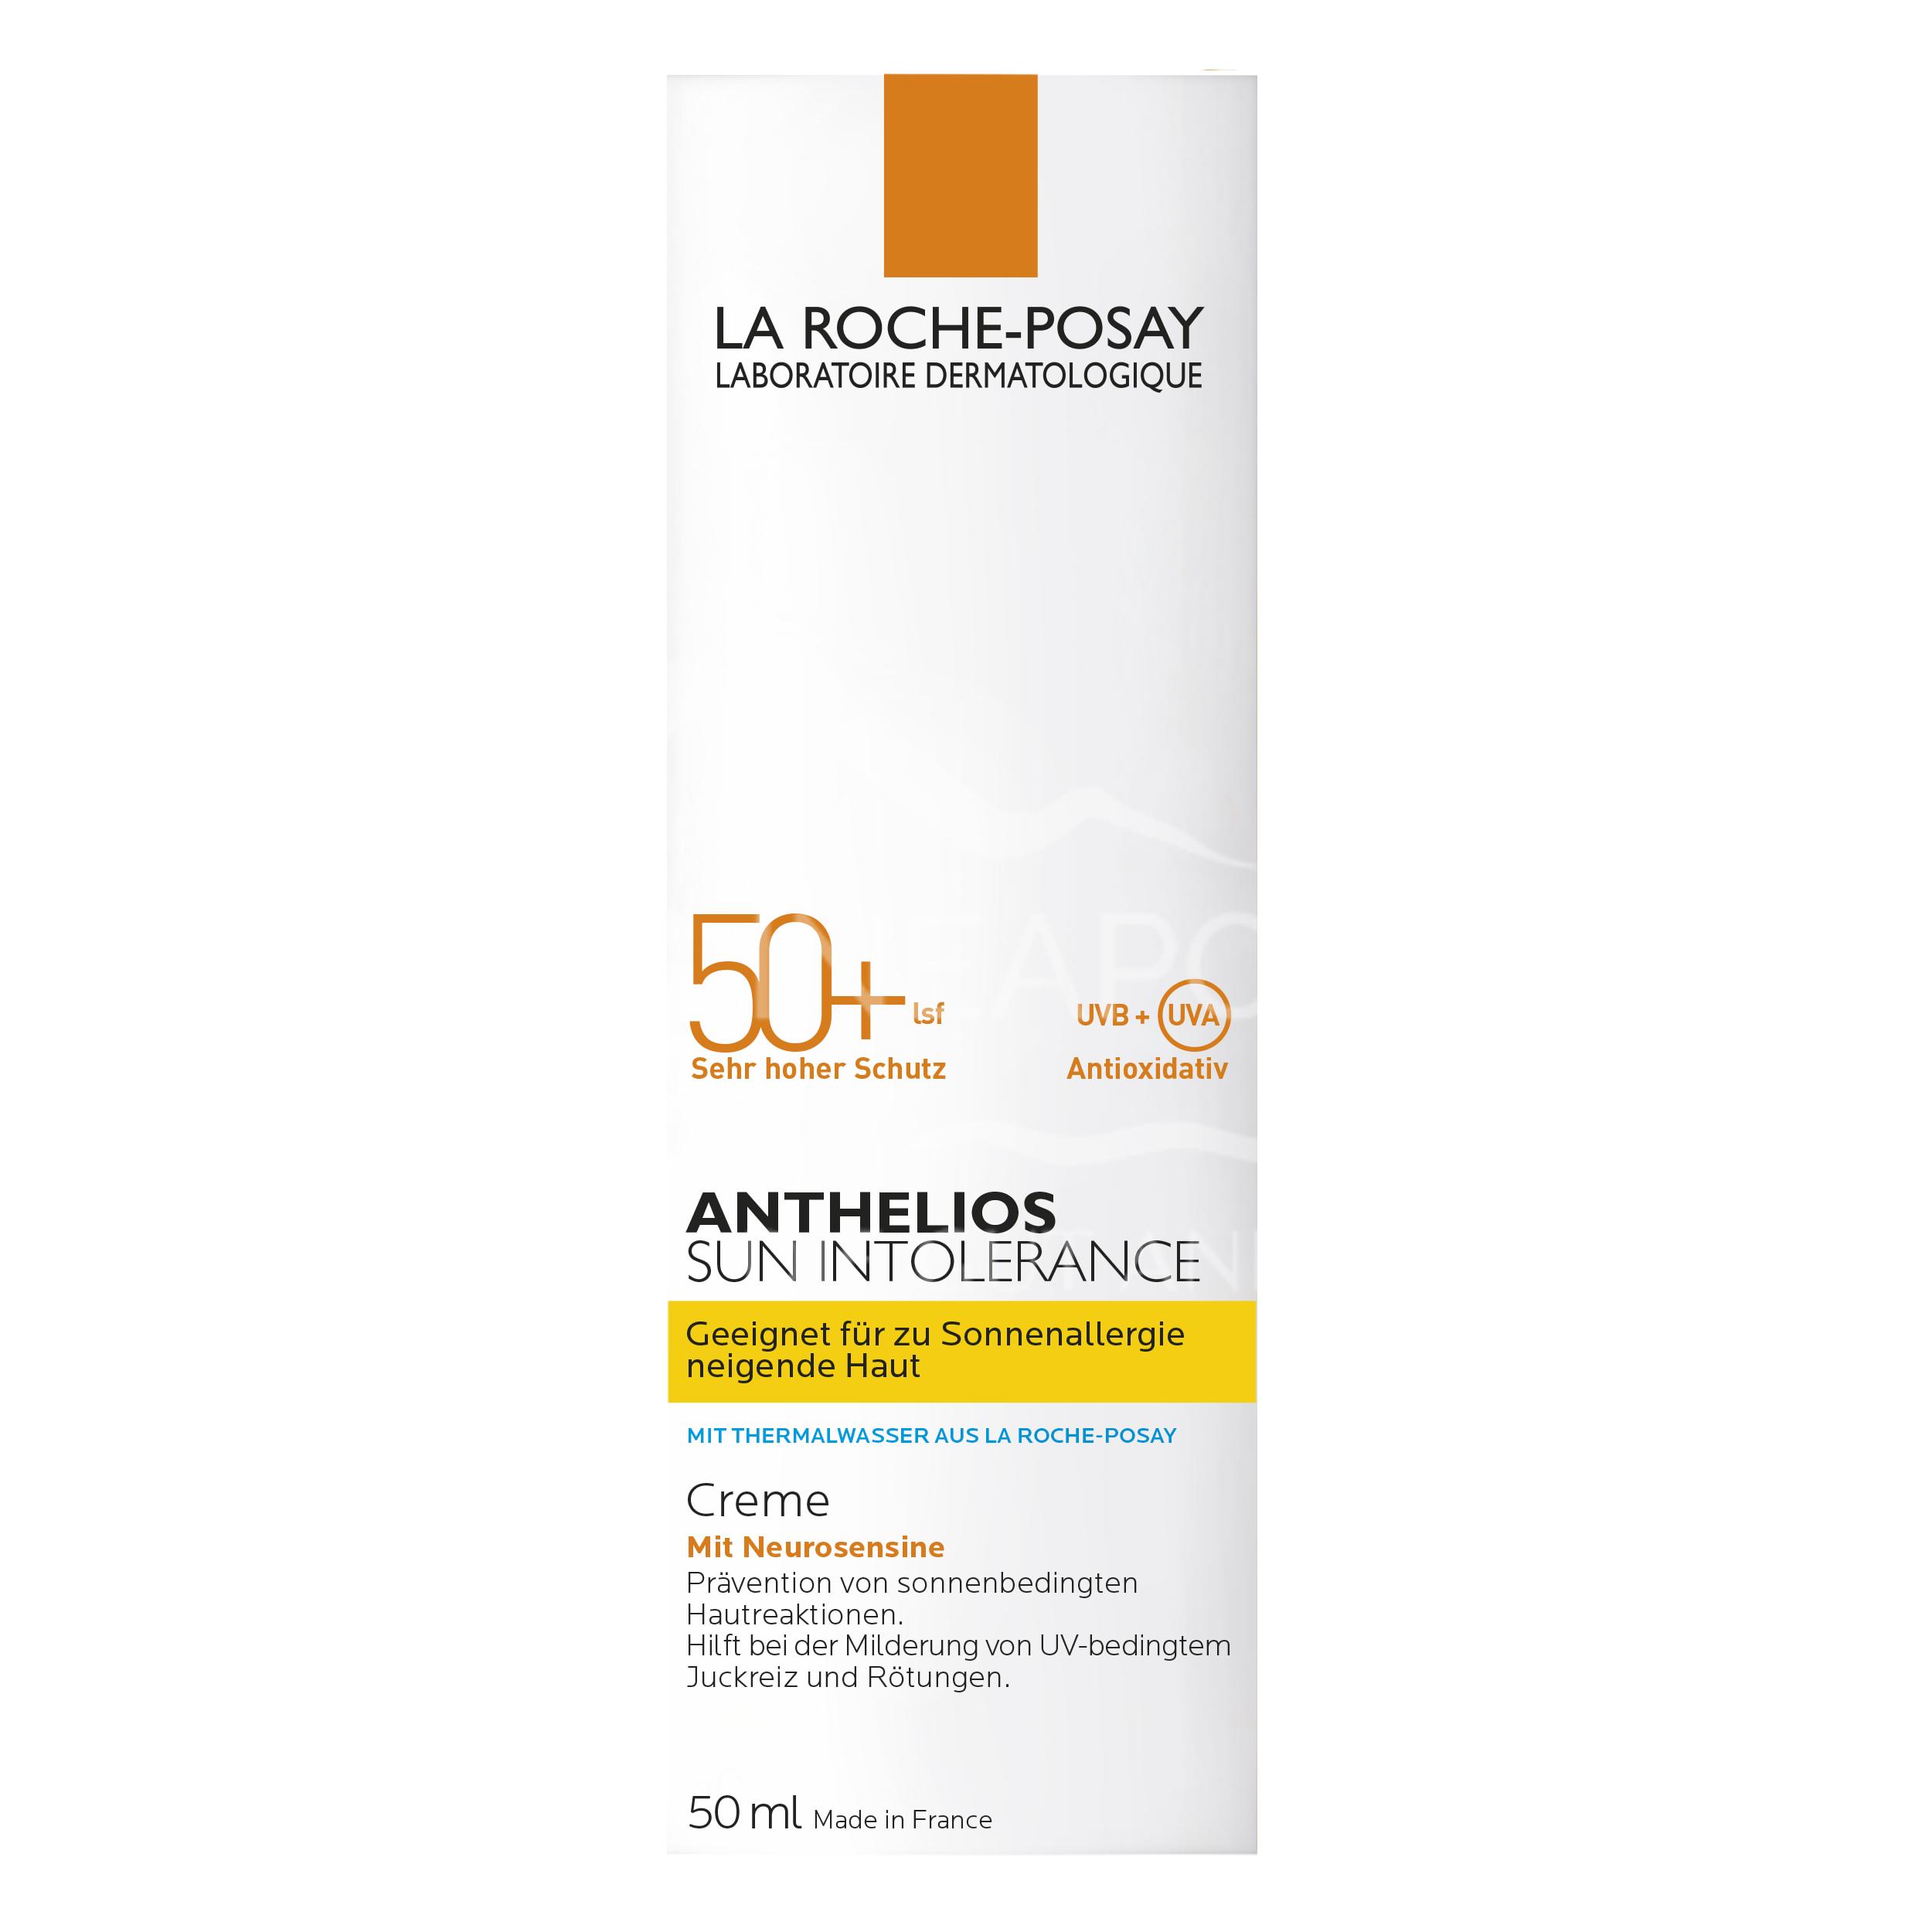 La Roche-Posay Anthelios Sun Intolerance 50+